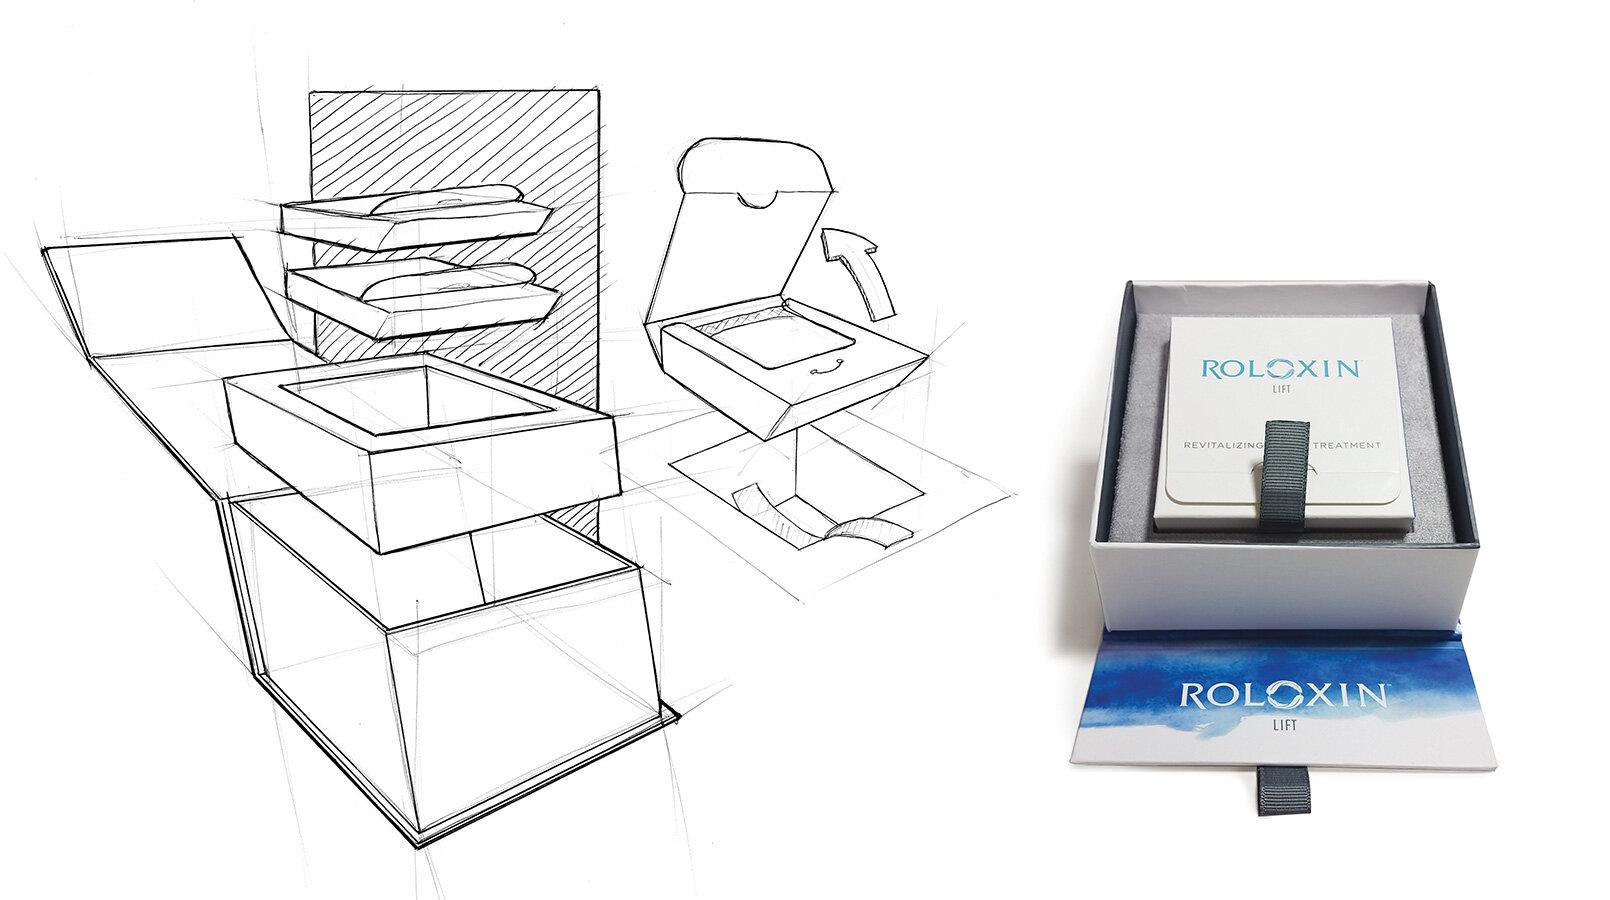 Roloxin-Lift-Skincare-Box-Packaging-Company-Design-2.JPG